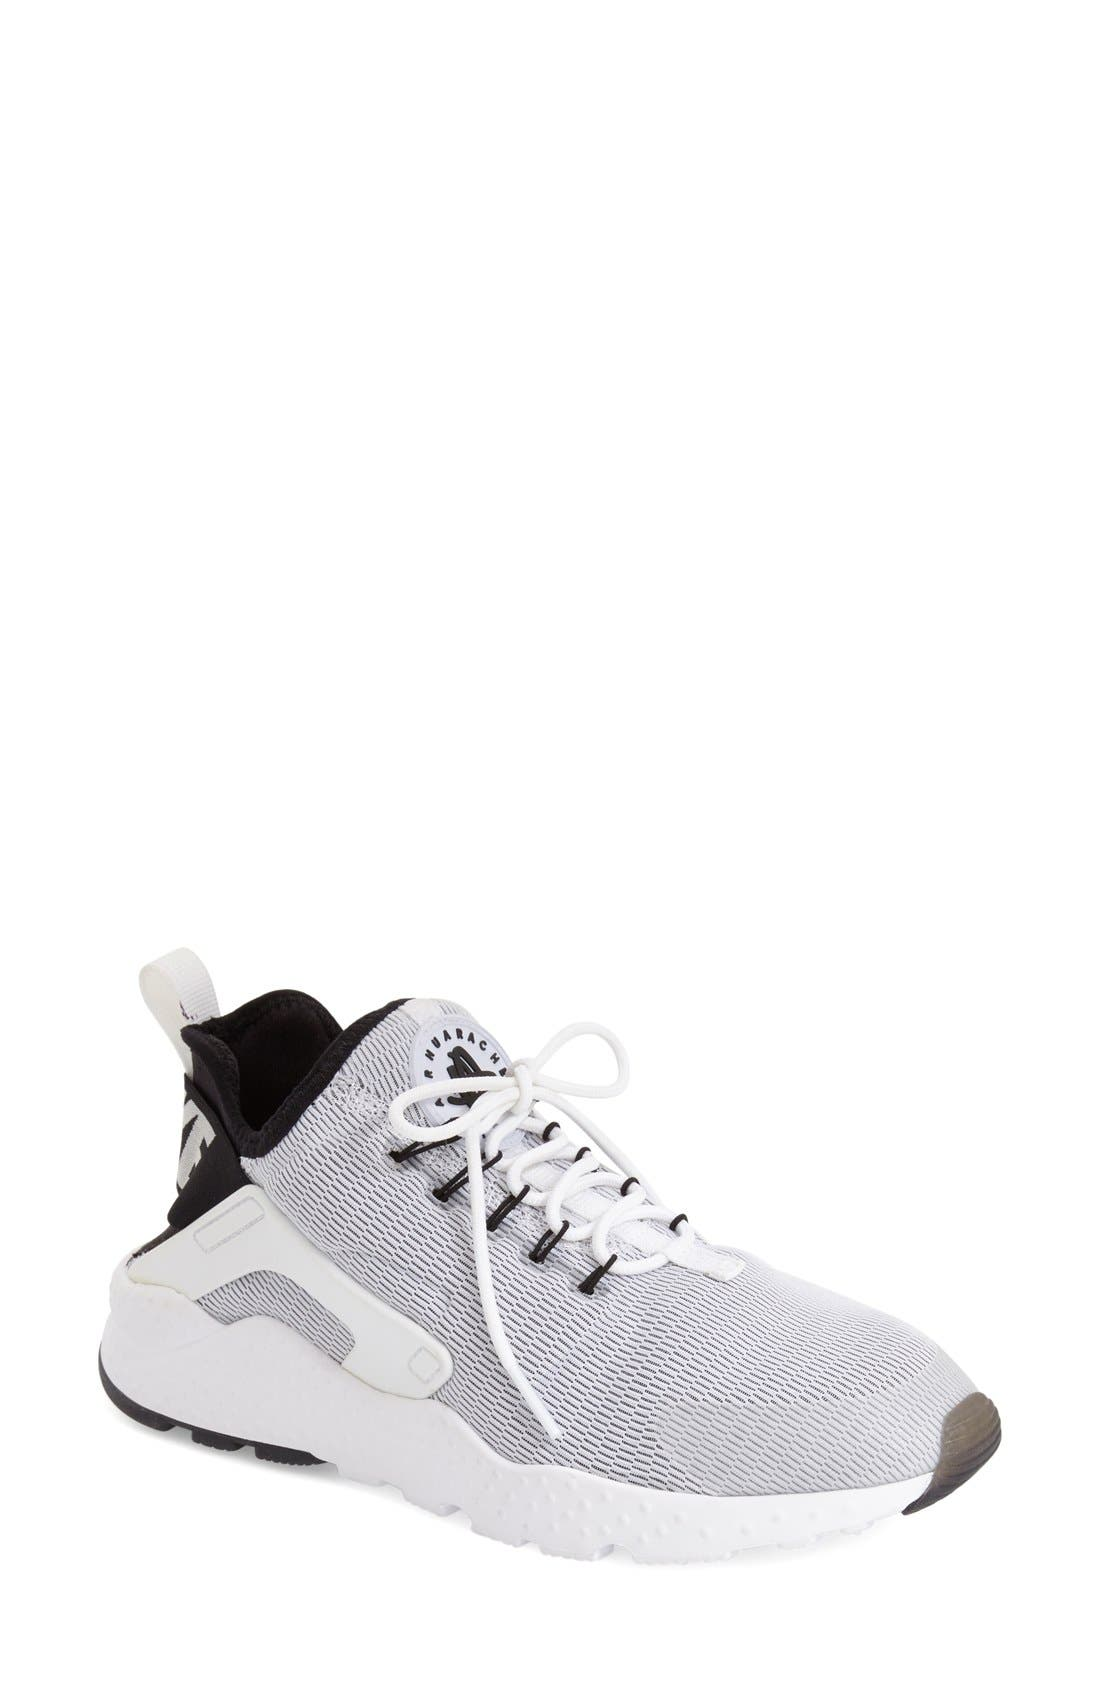 Main Image - Nike Air Huarache Sneaker (Women)